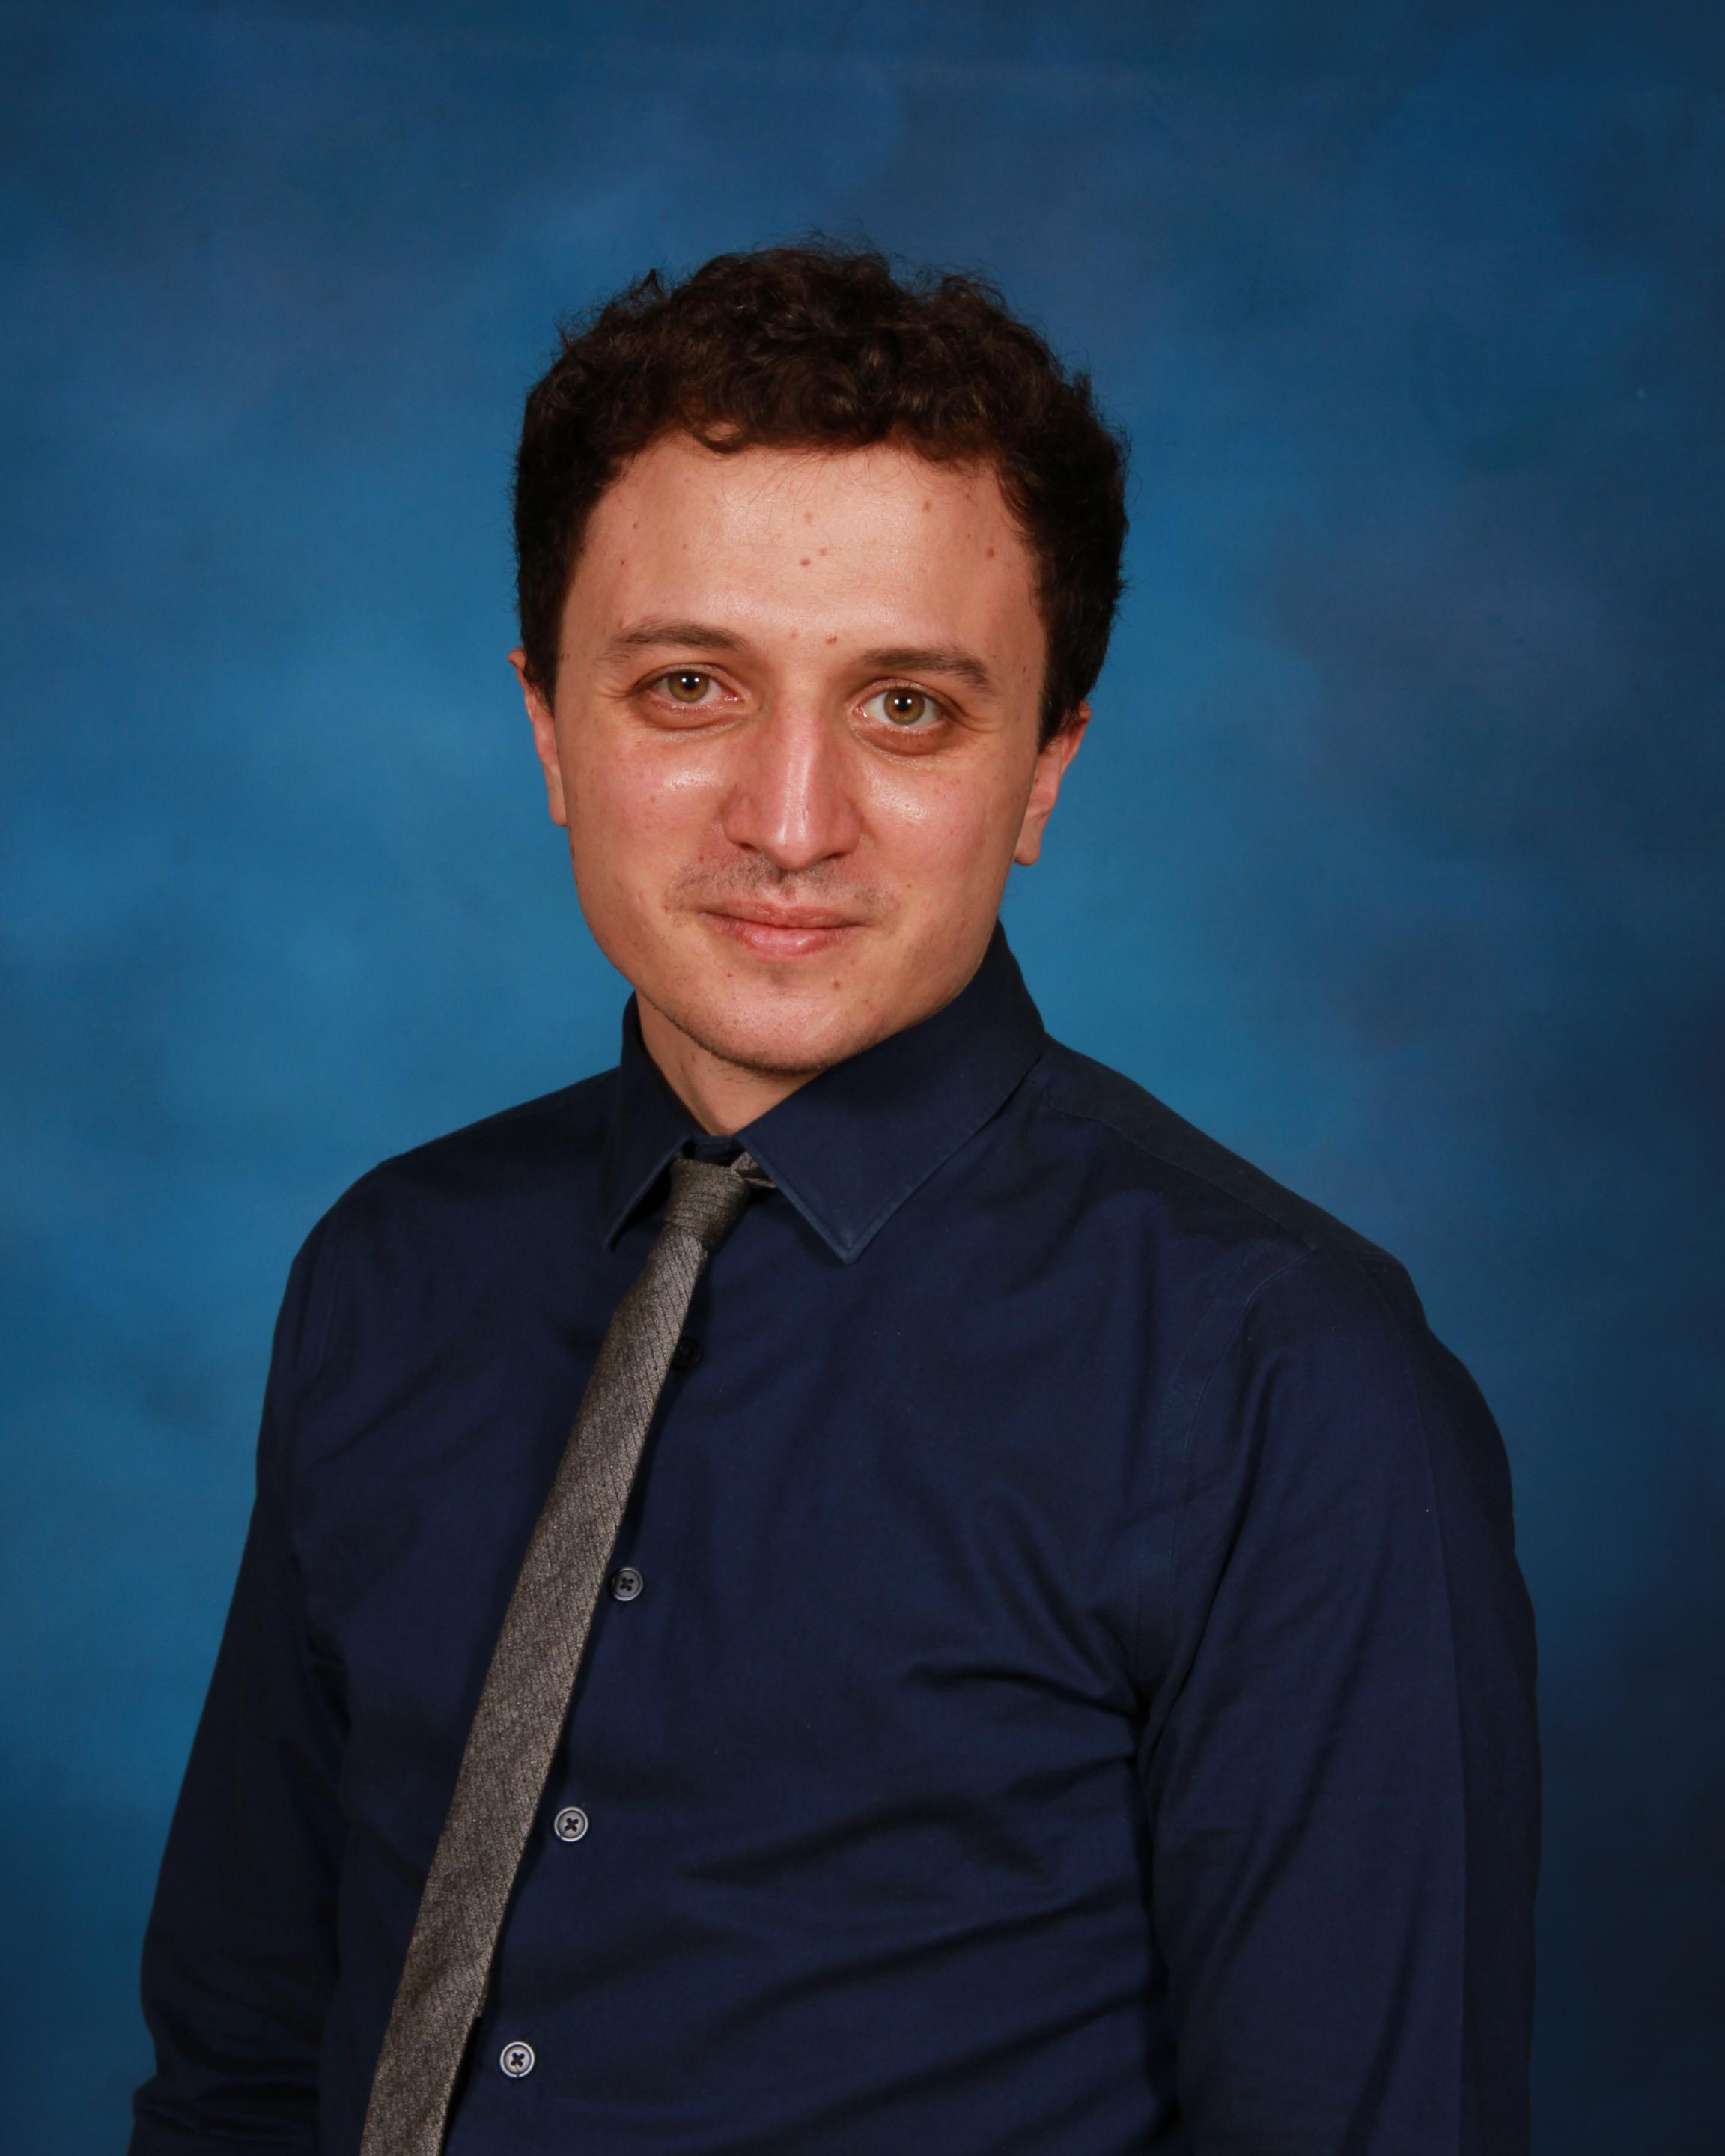 Benjamin Piacquadio